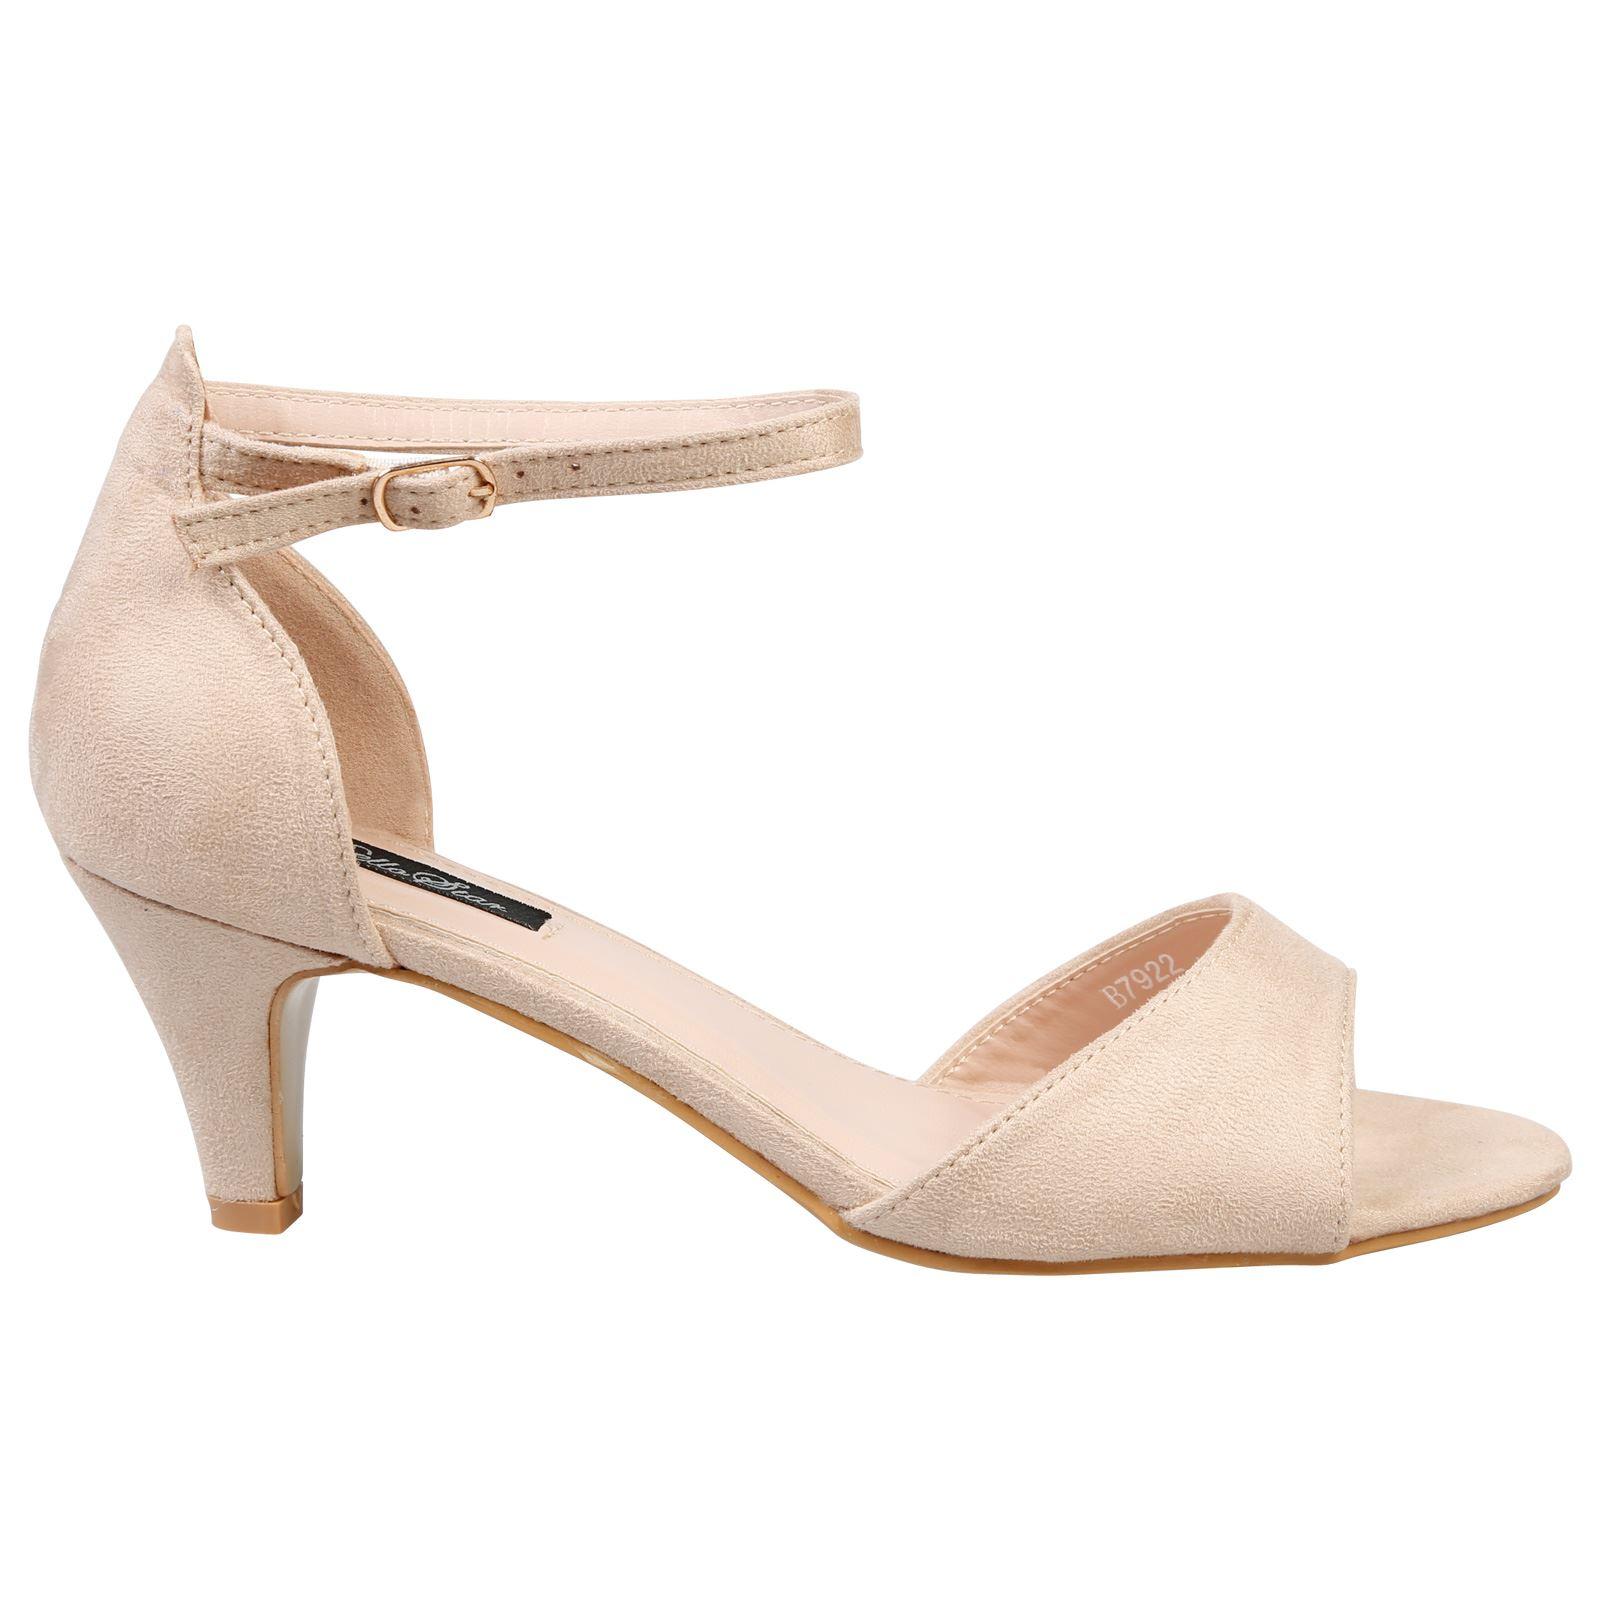 5975a918b87 Laurie Womens Low Mid Kitten Heel Ankle Strap Sandals Ladies Peep ...